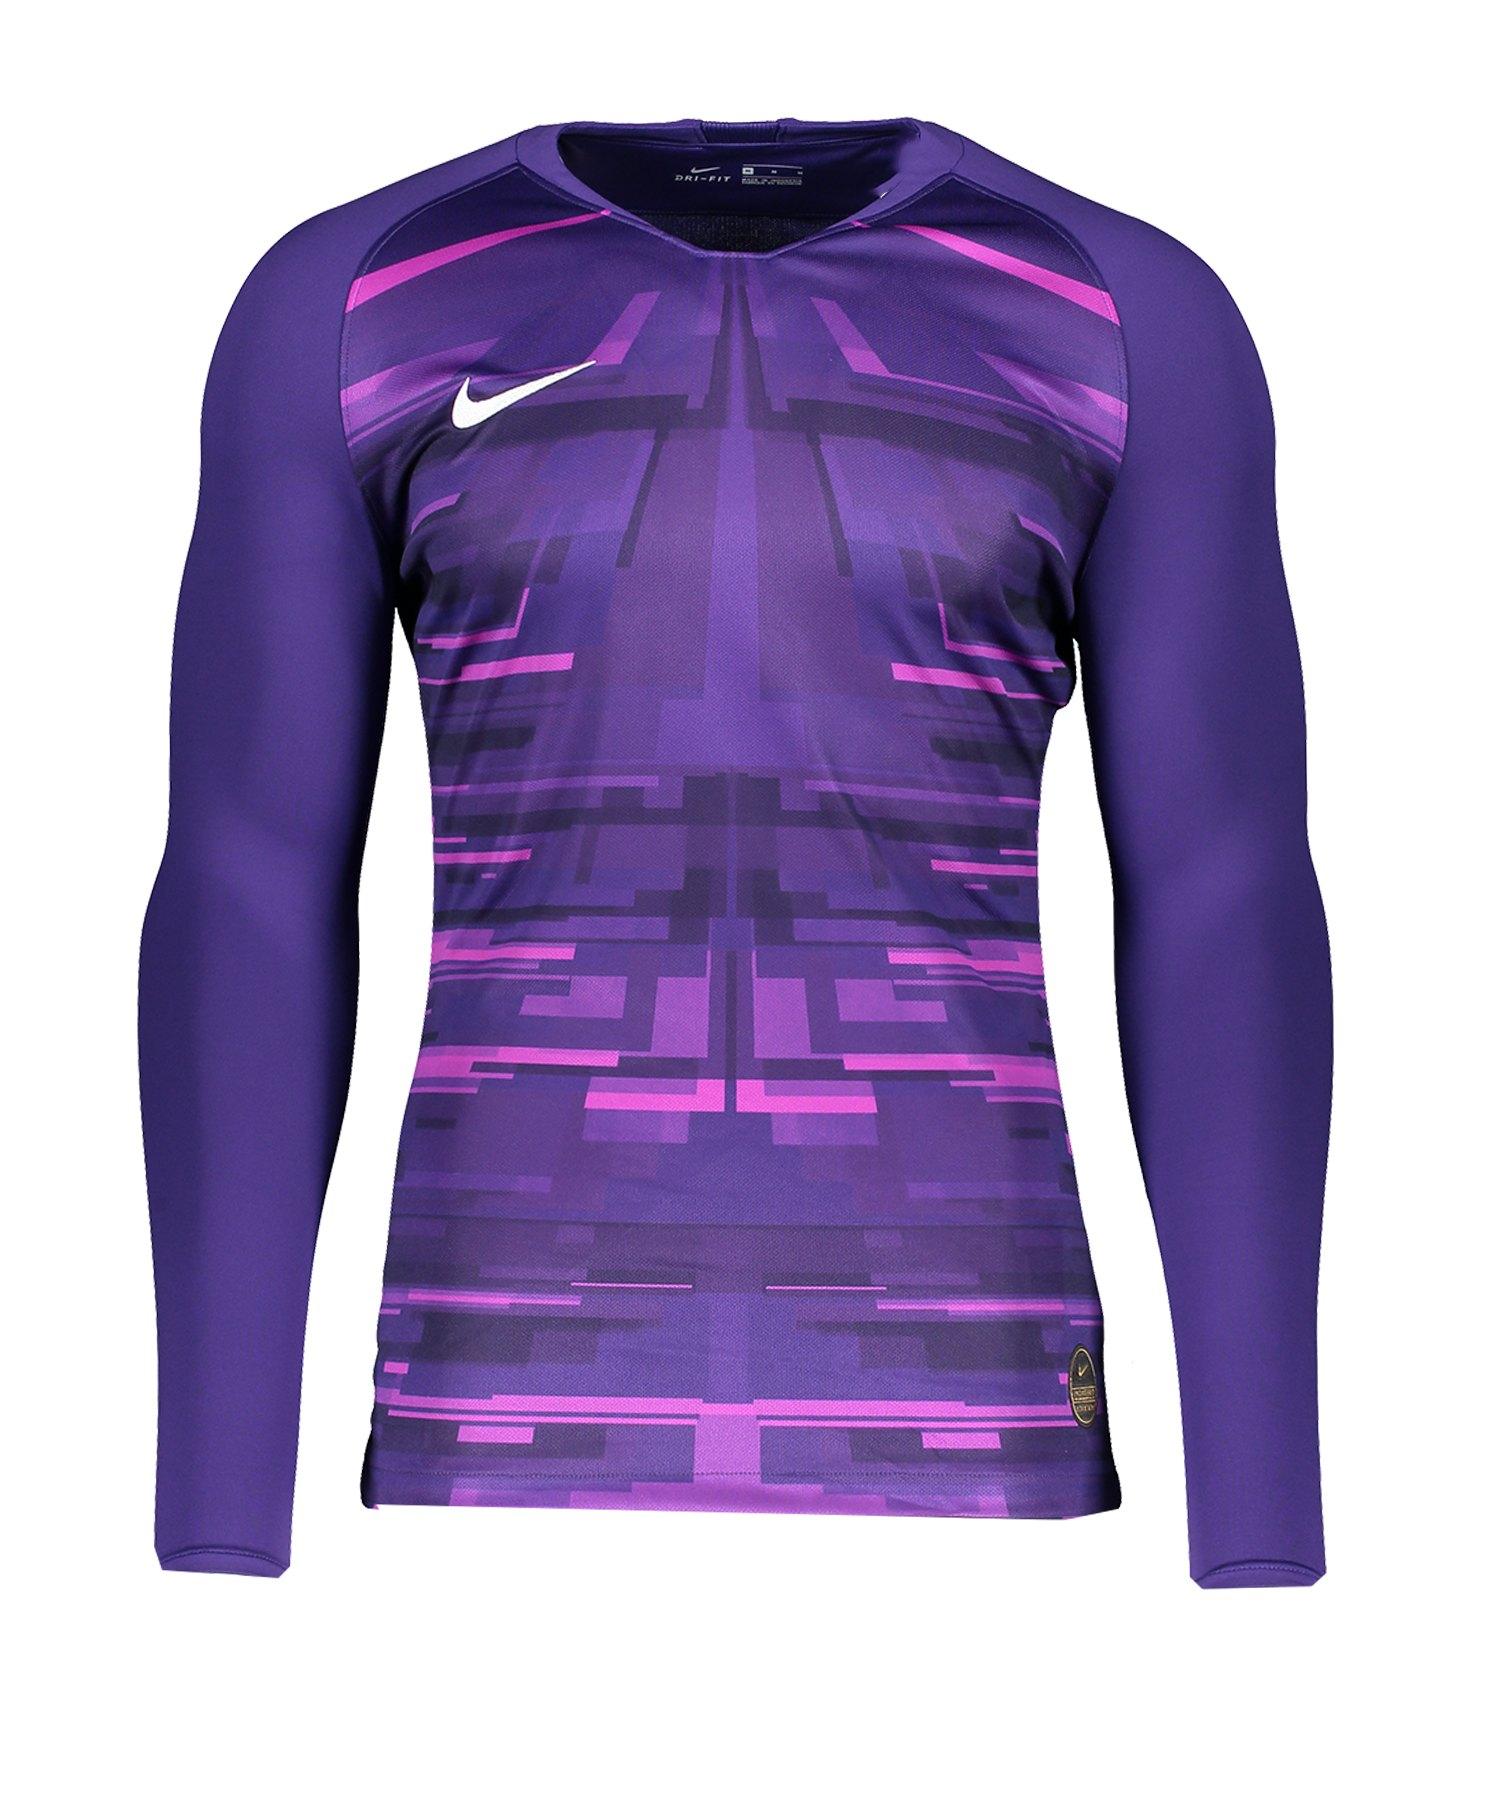 Nike Promo GK-Jersey LS Lila Weiss F547 - lila